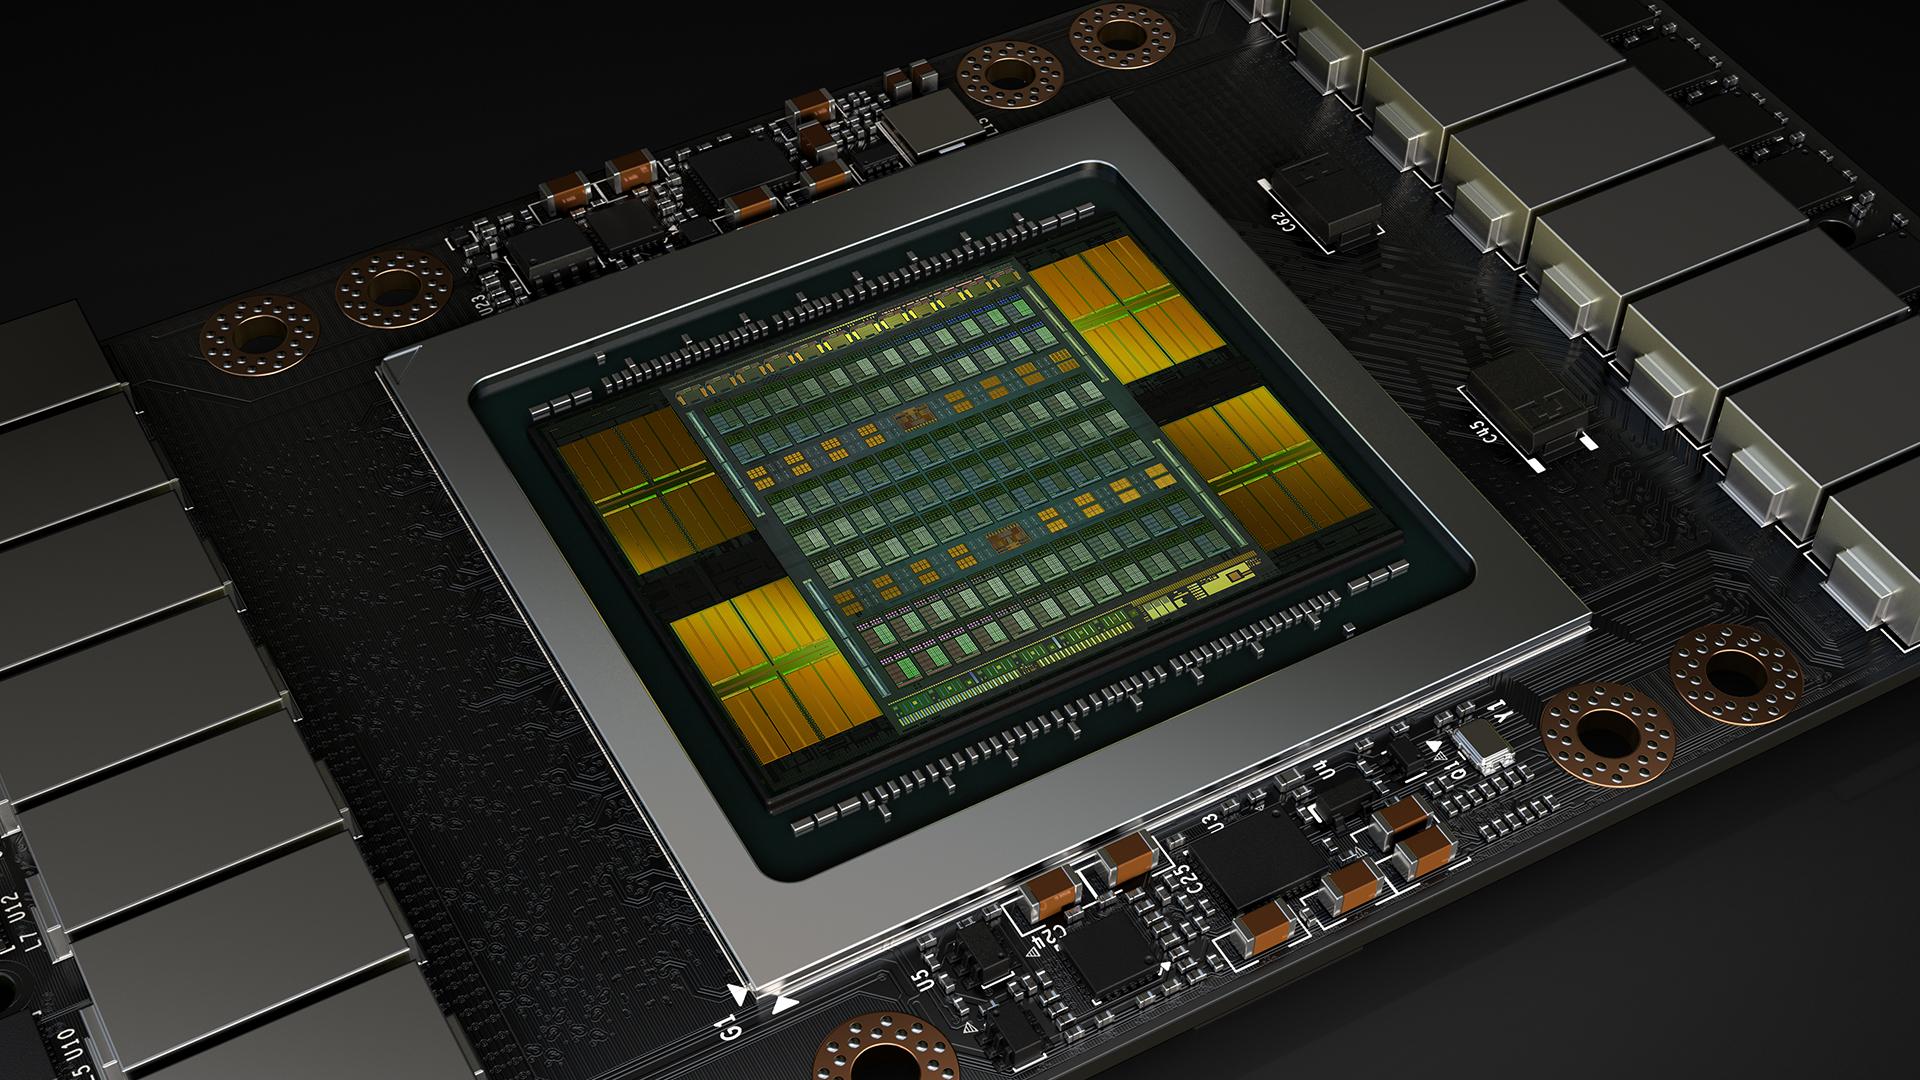 Internal view of NVIDIA's Tesla V100 data center GPU.